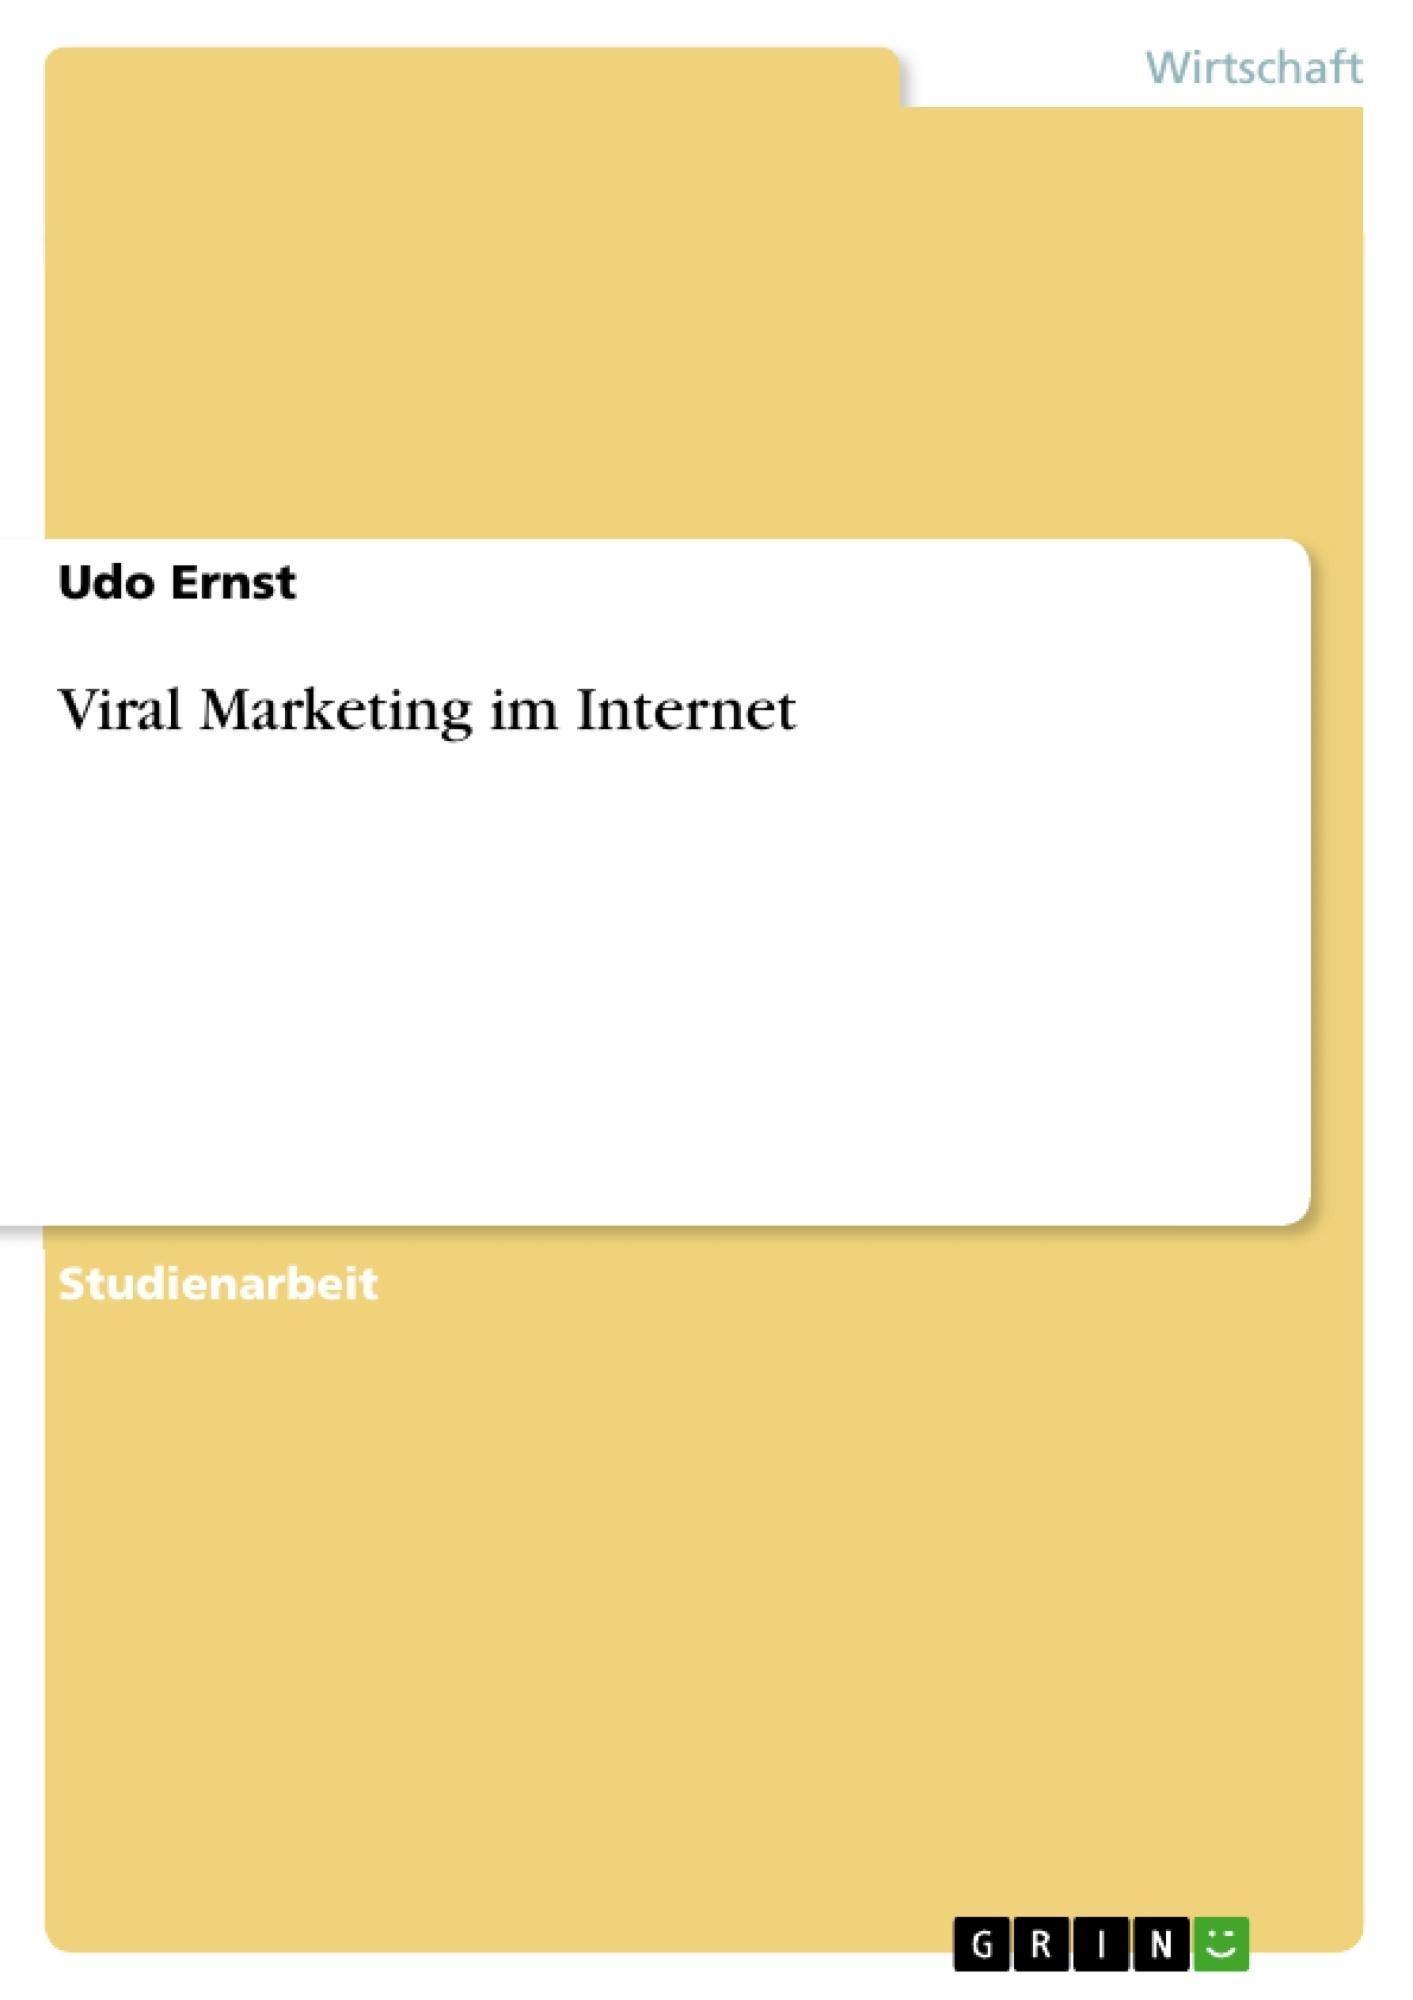 Titel: Viral Marketing im Internet